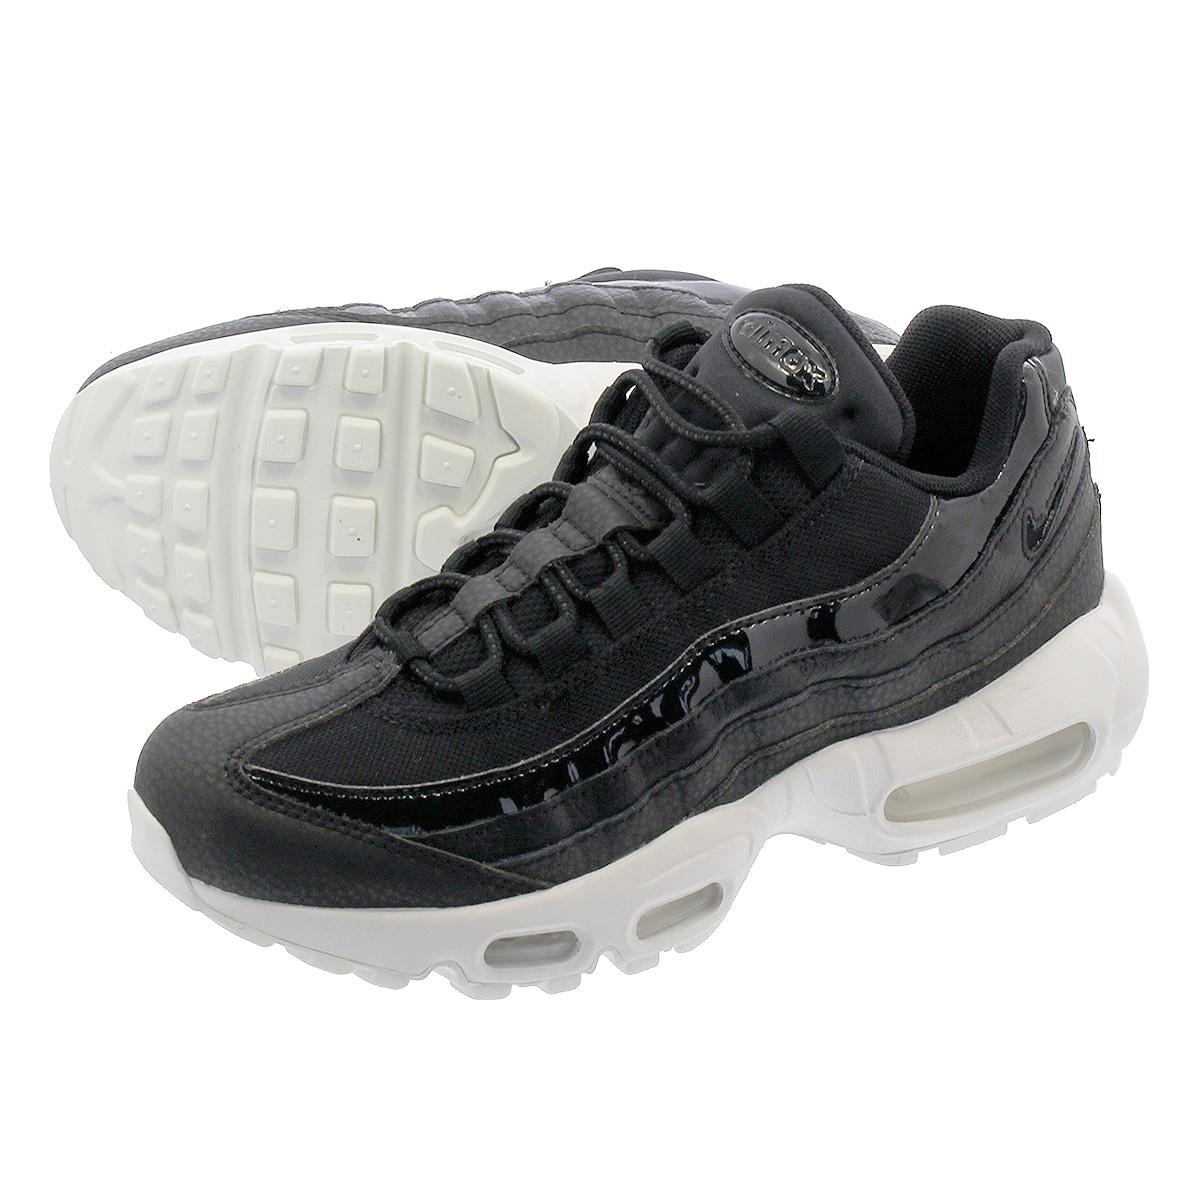 1324259321 LOWTEX PLUS: NIKE WMNS AIR MAX 95 SE Nike women Air Max 95 SE BLACK ...